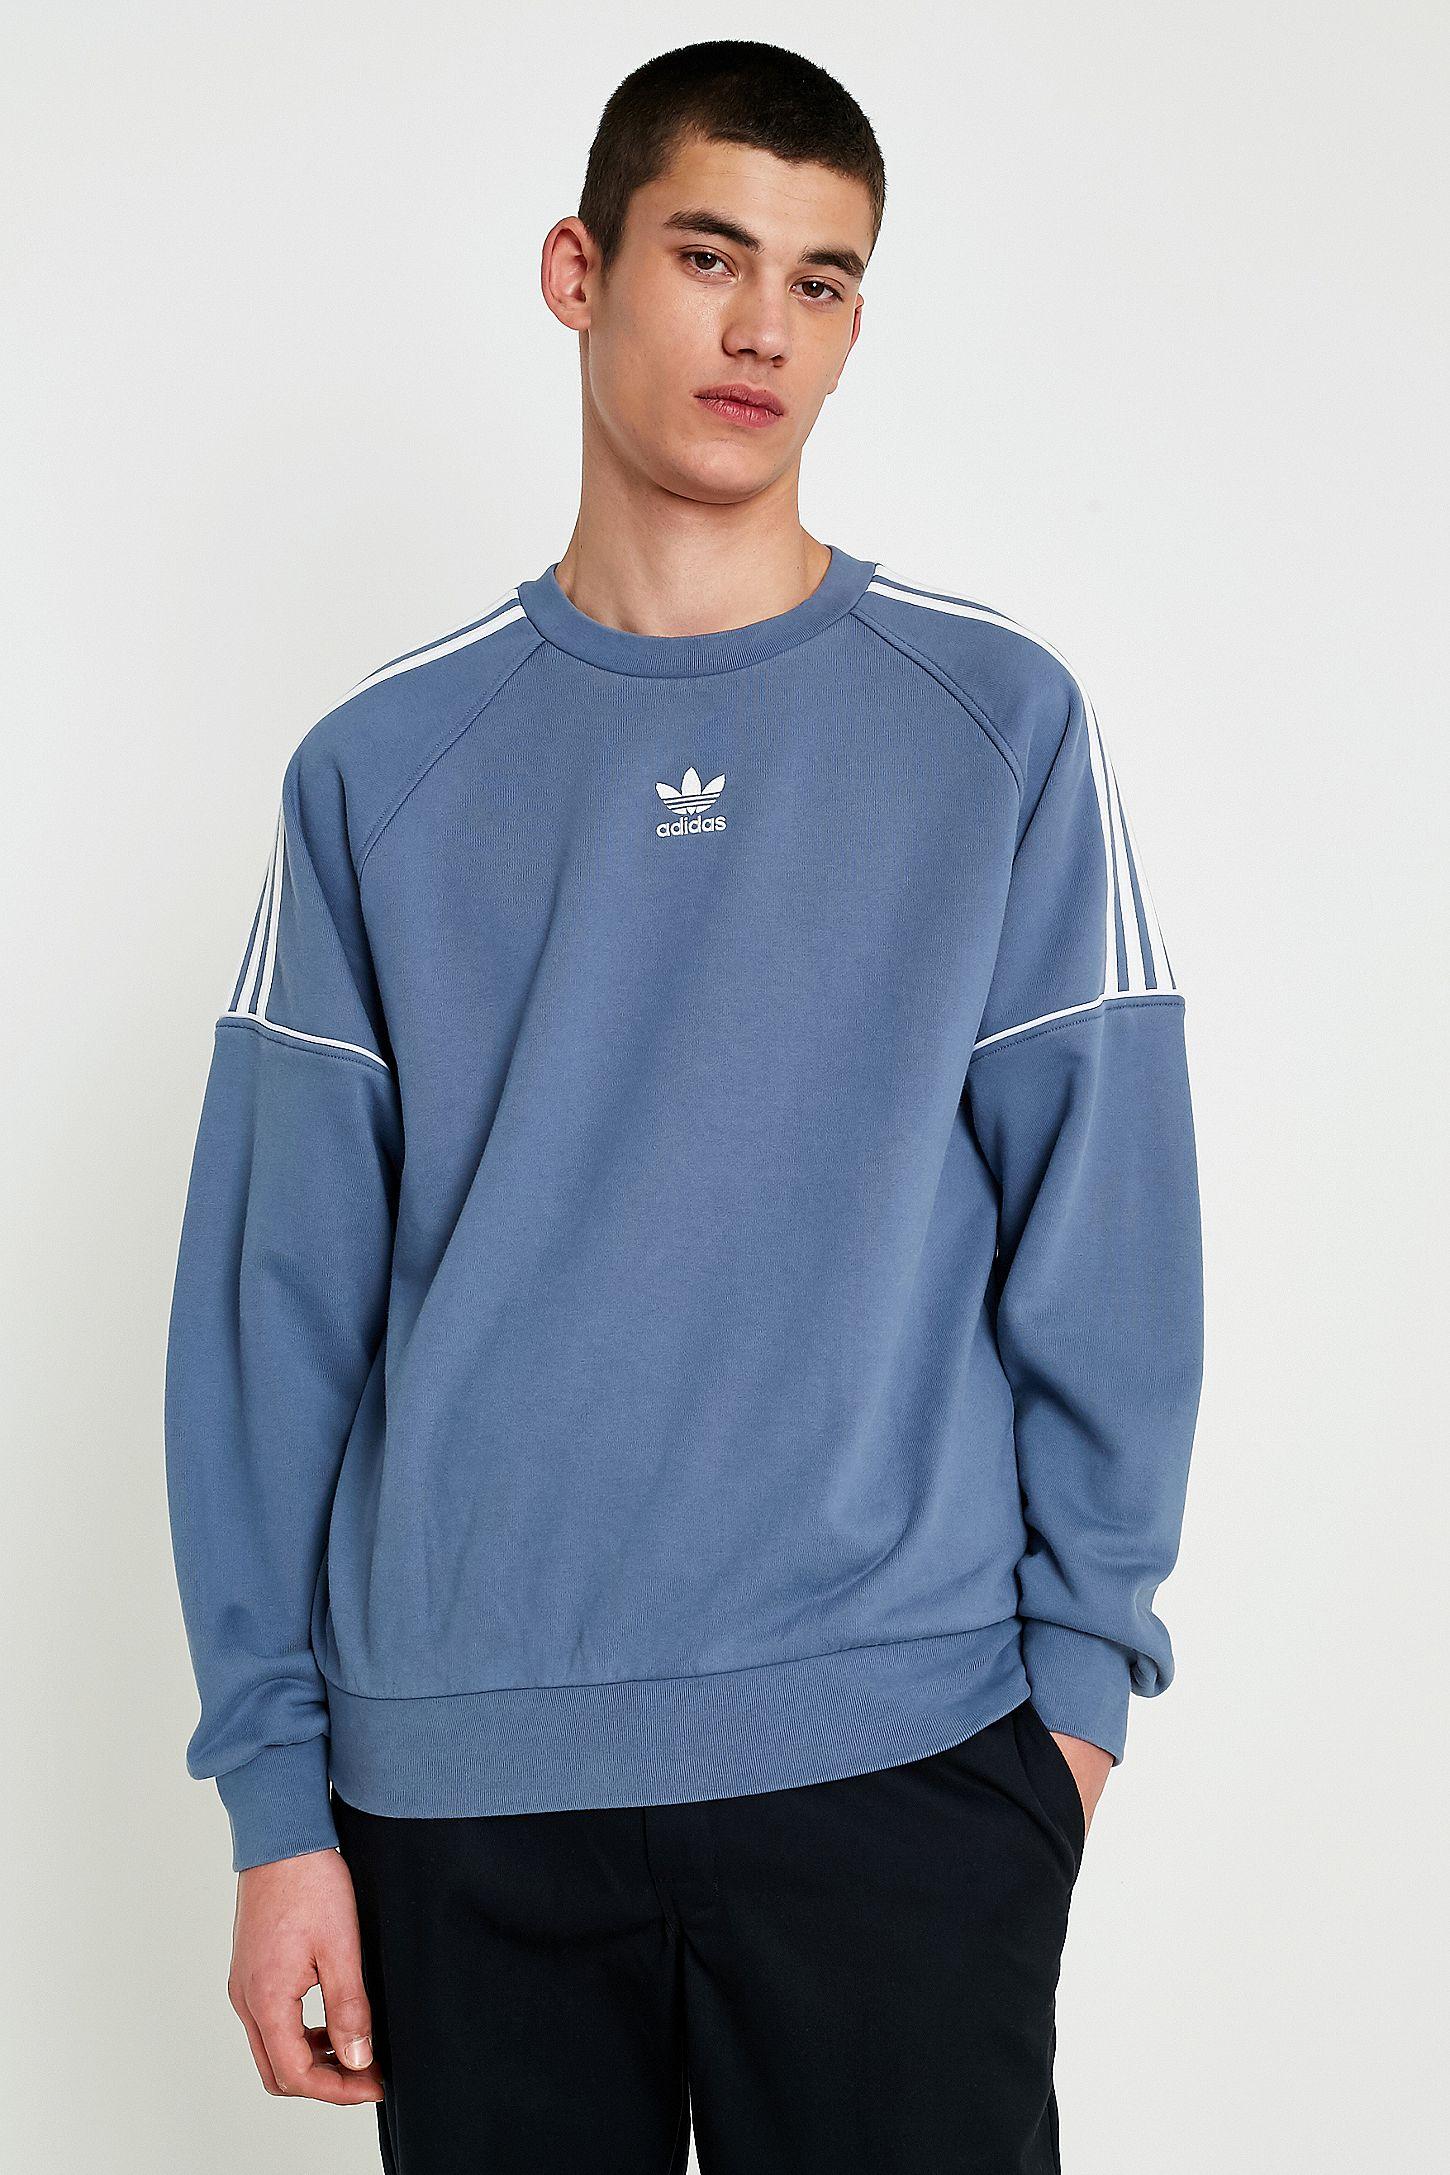 3 Urban Originals Adidas Pipe Raw Stripe Xb6wvquyyy Steel Sweatshirt 4RAL3j5